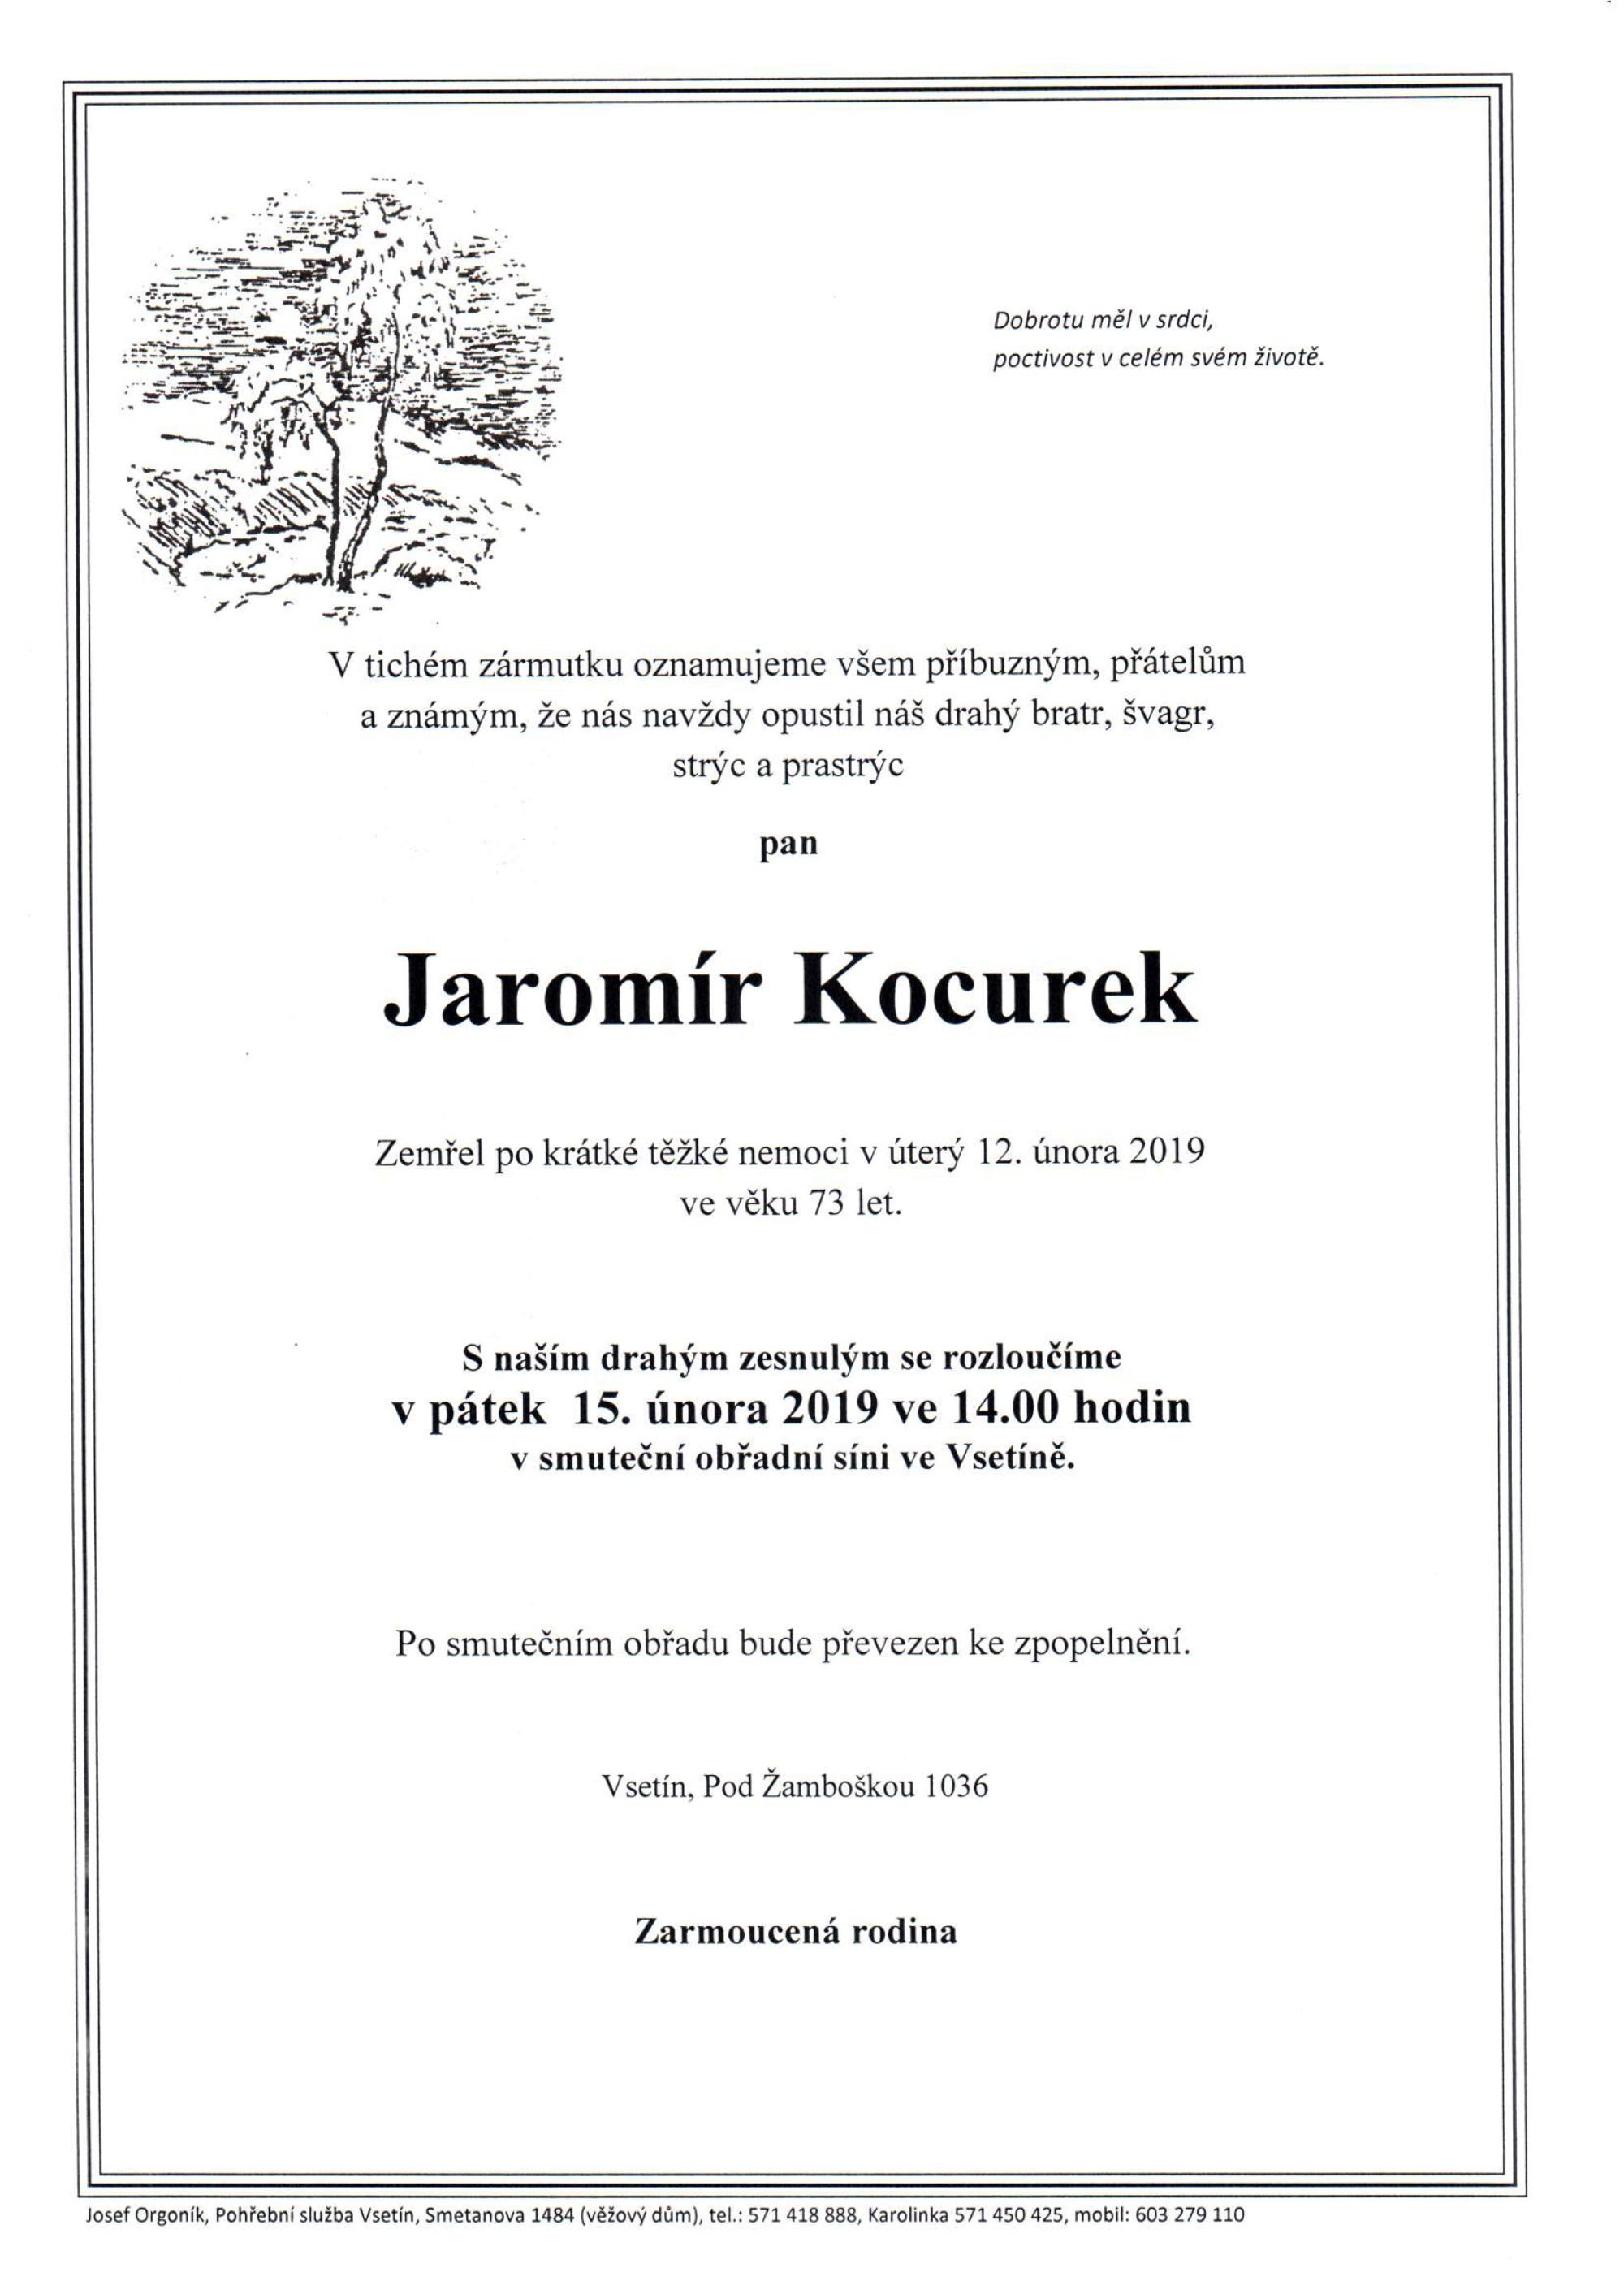 Jaromír Kocurek